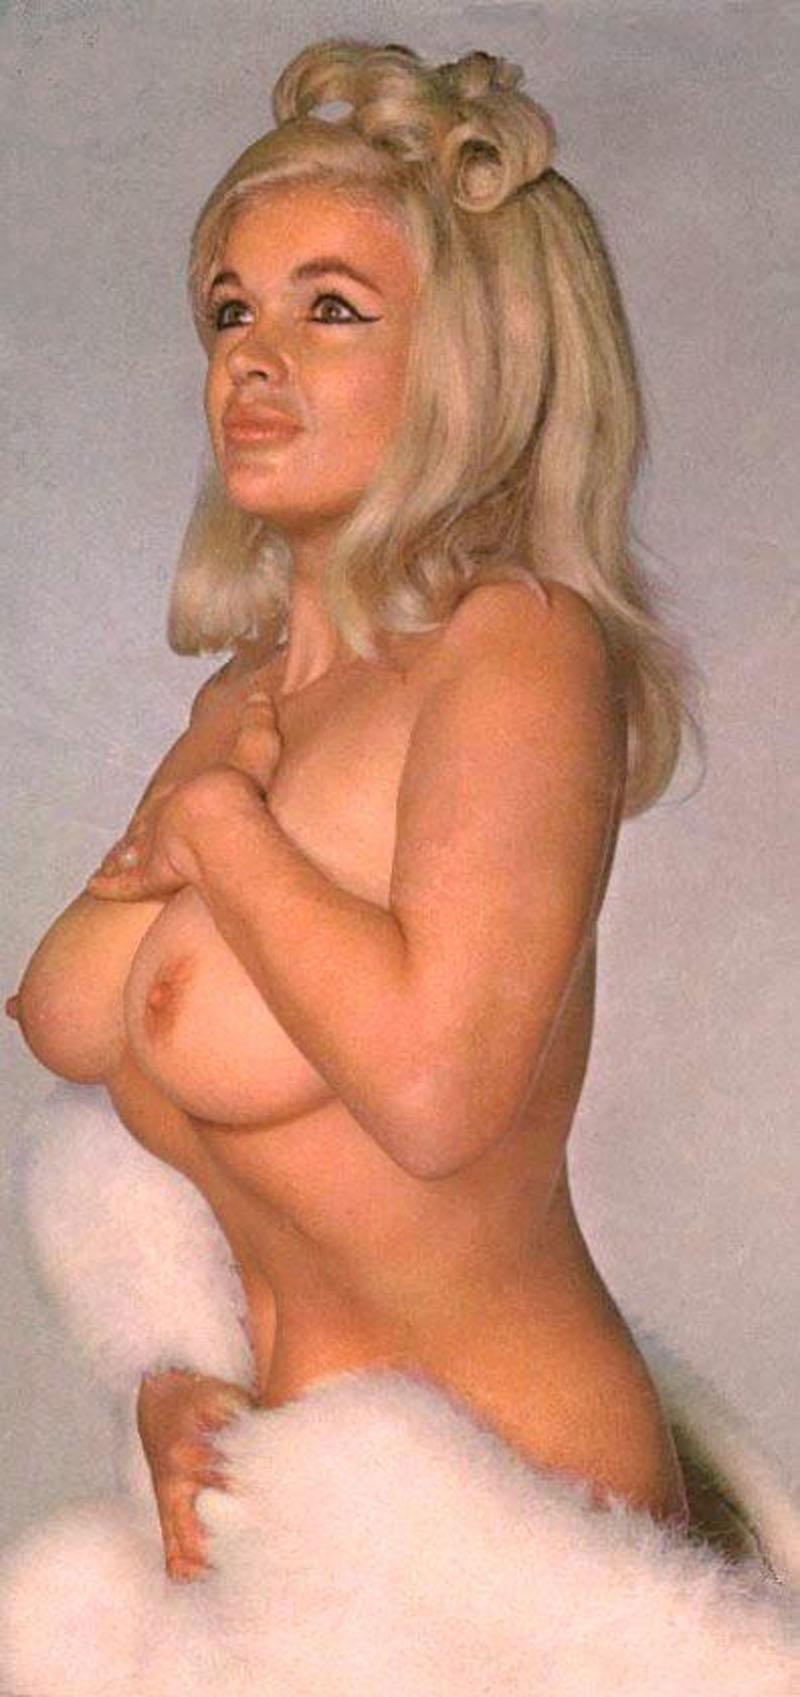 Jayne mansfield nude videos